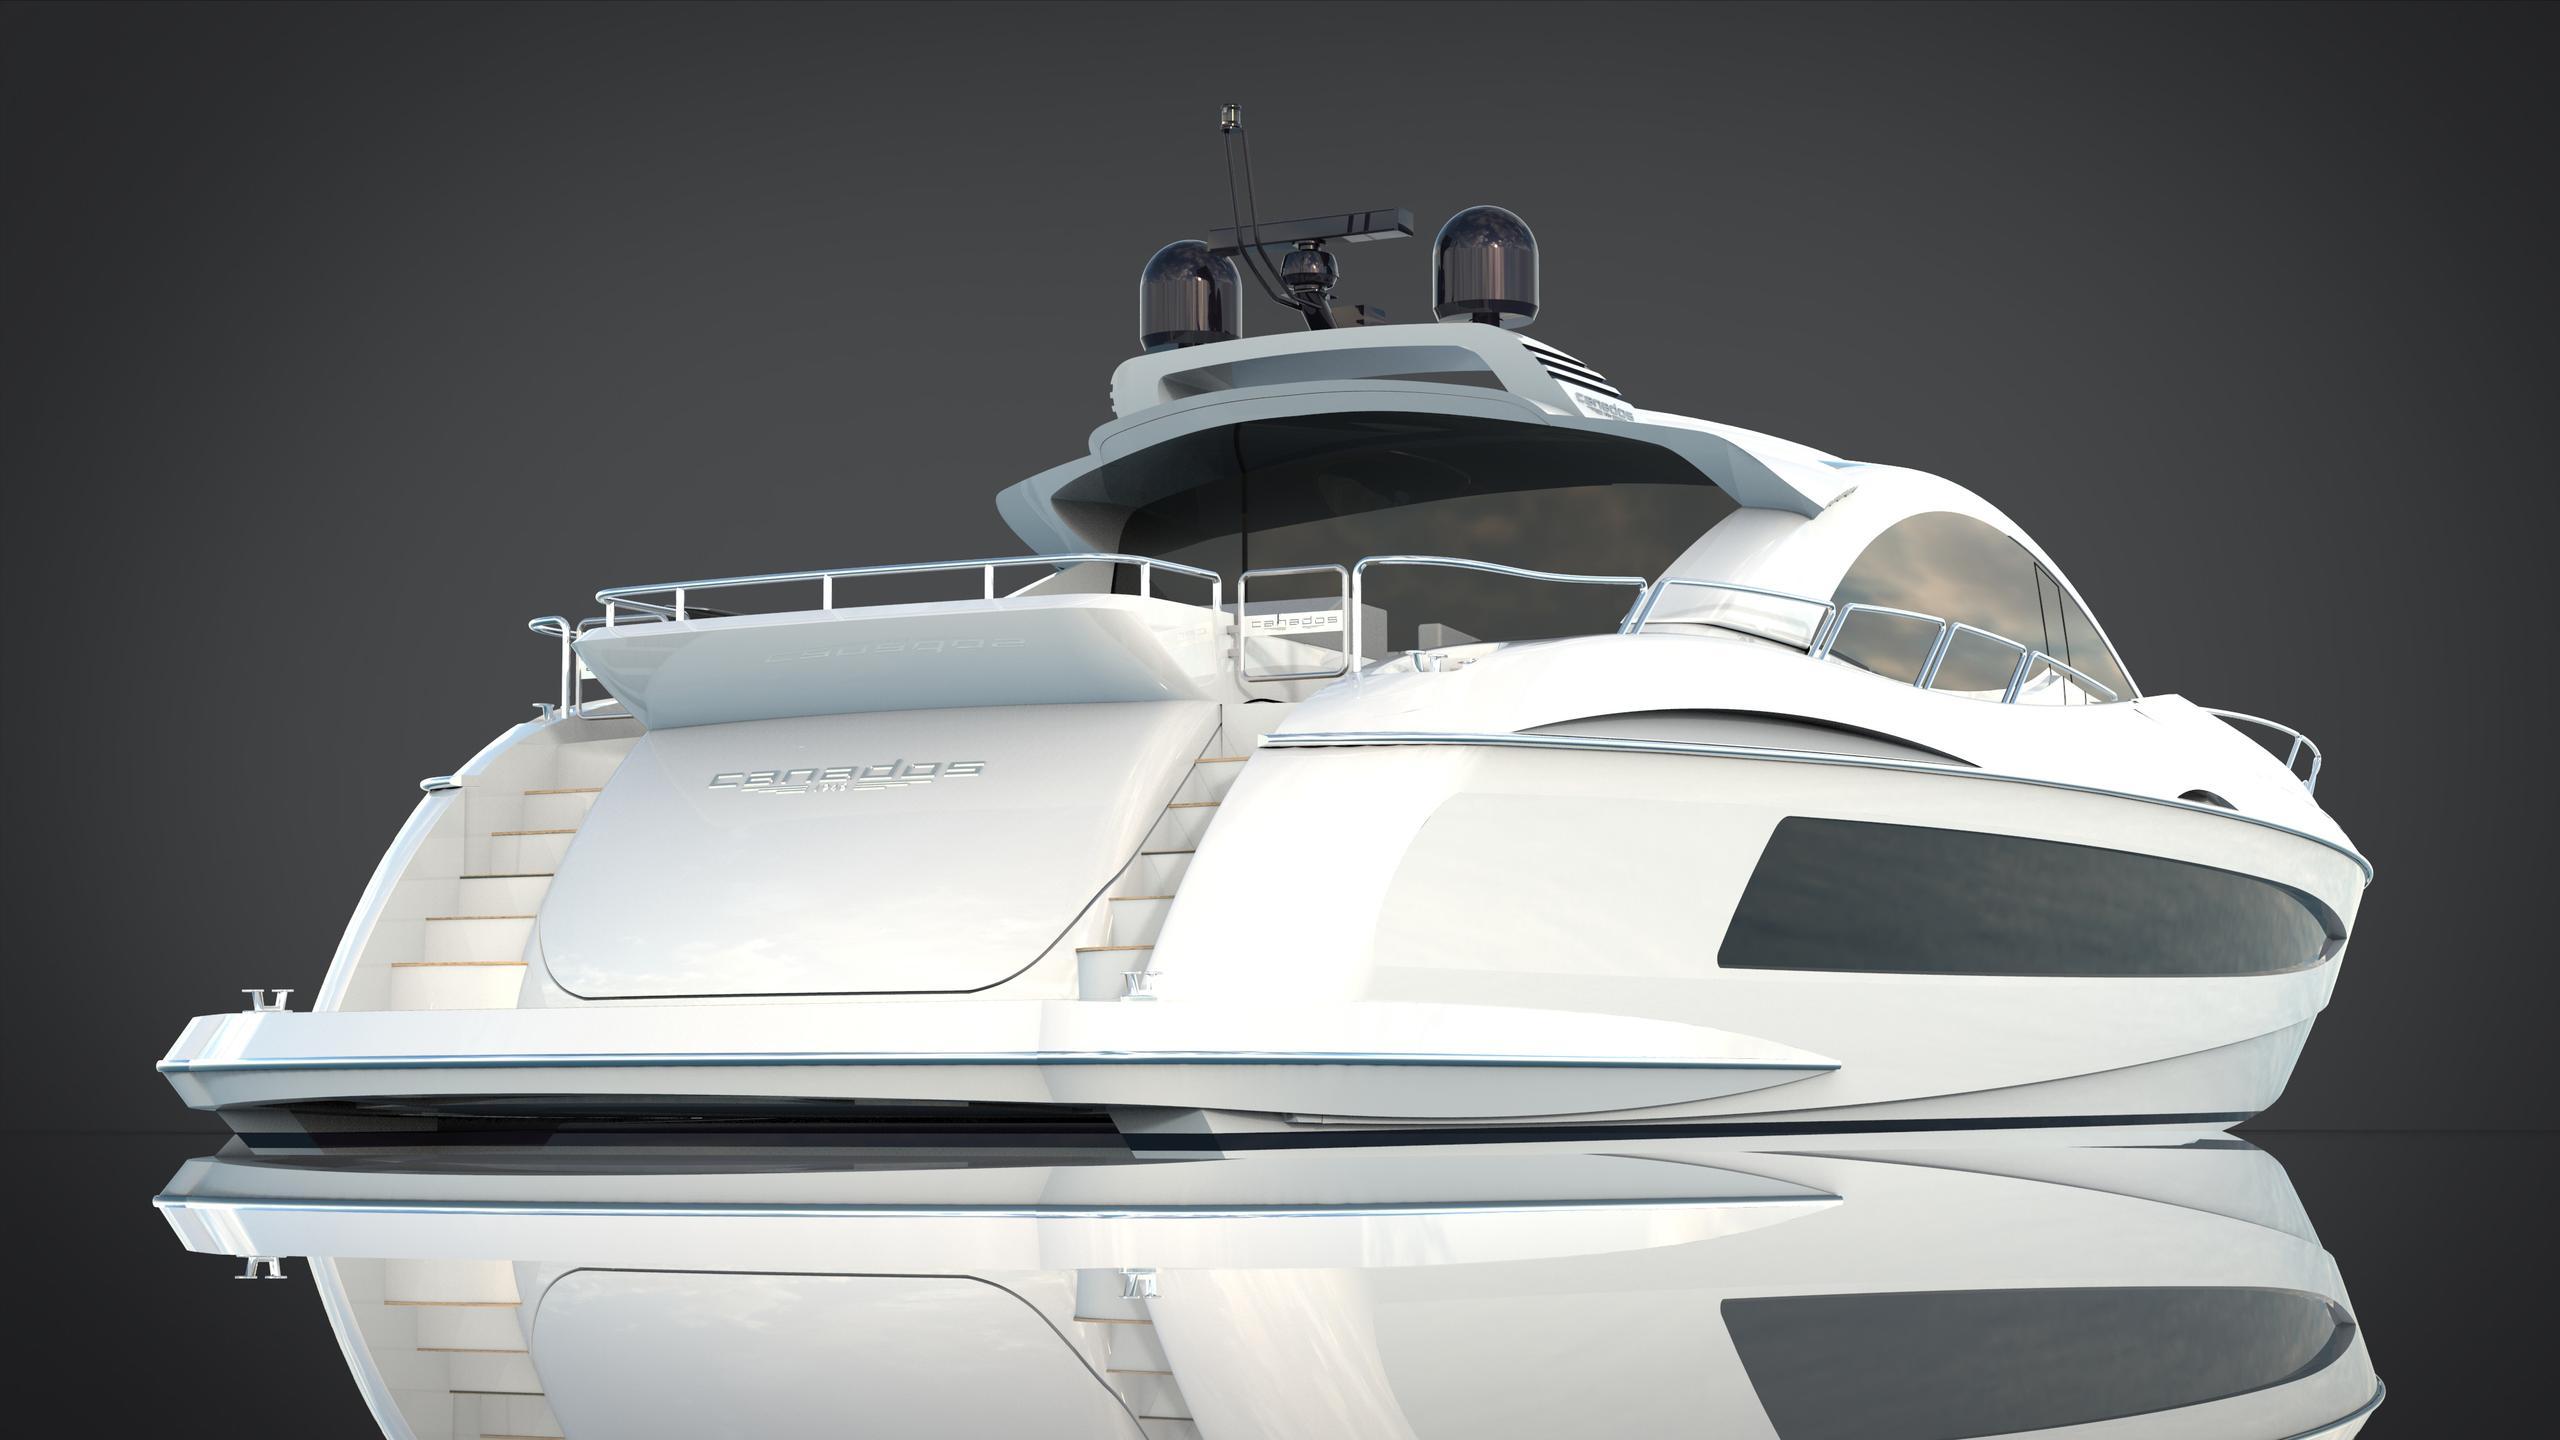 canados-90-gladiator-motoryacht-canados-2017-27m-stern-rendering